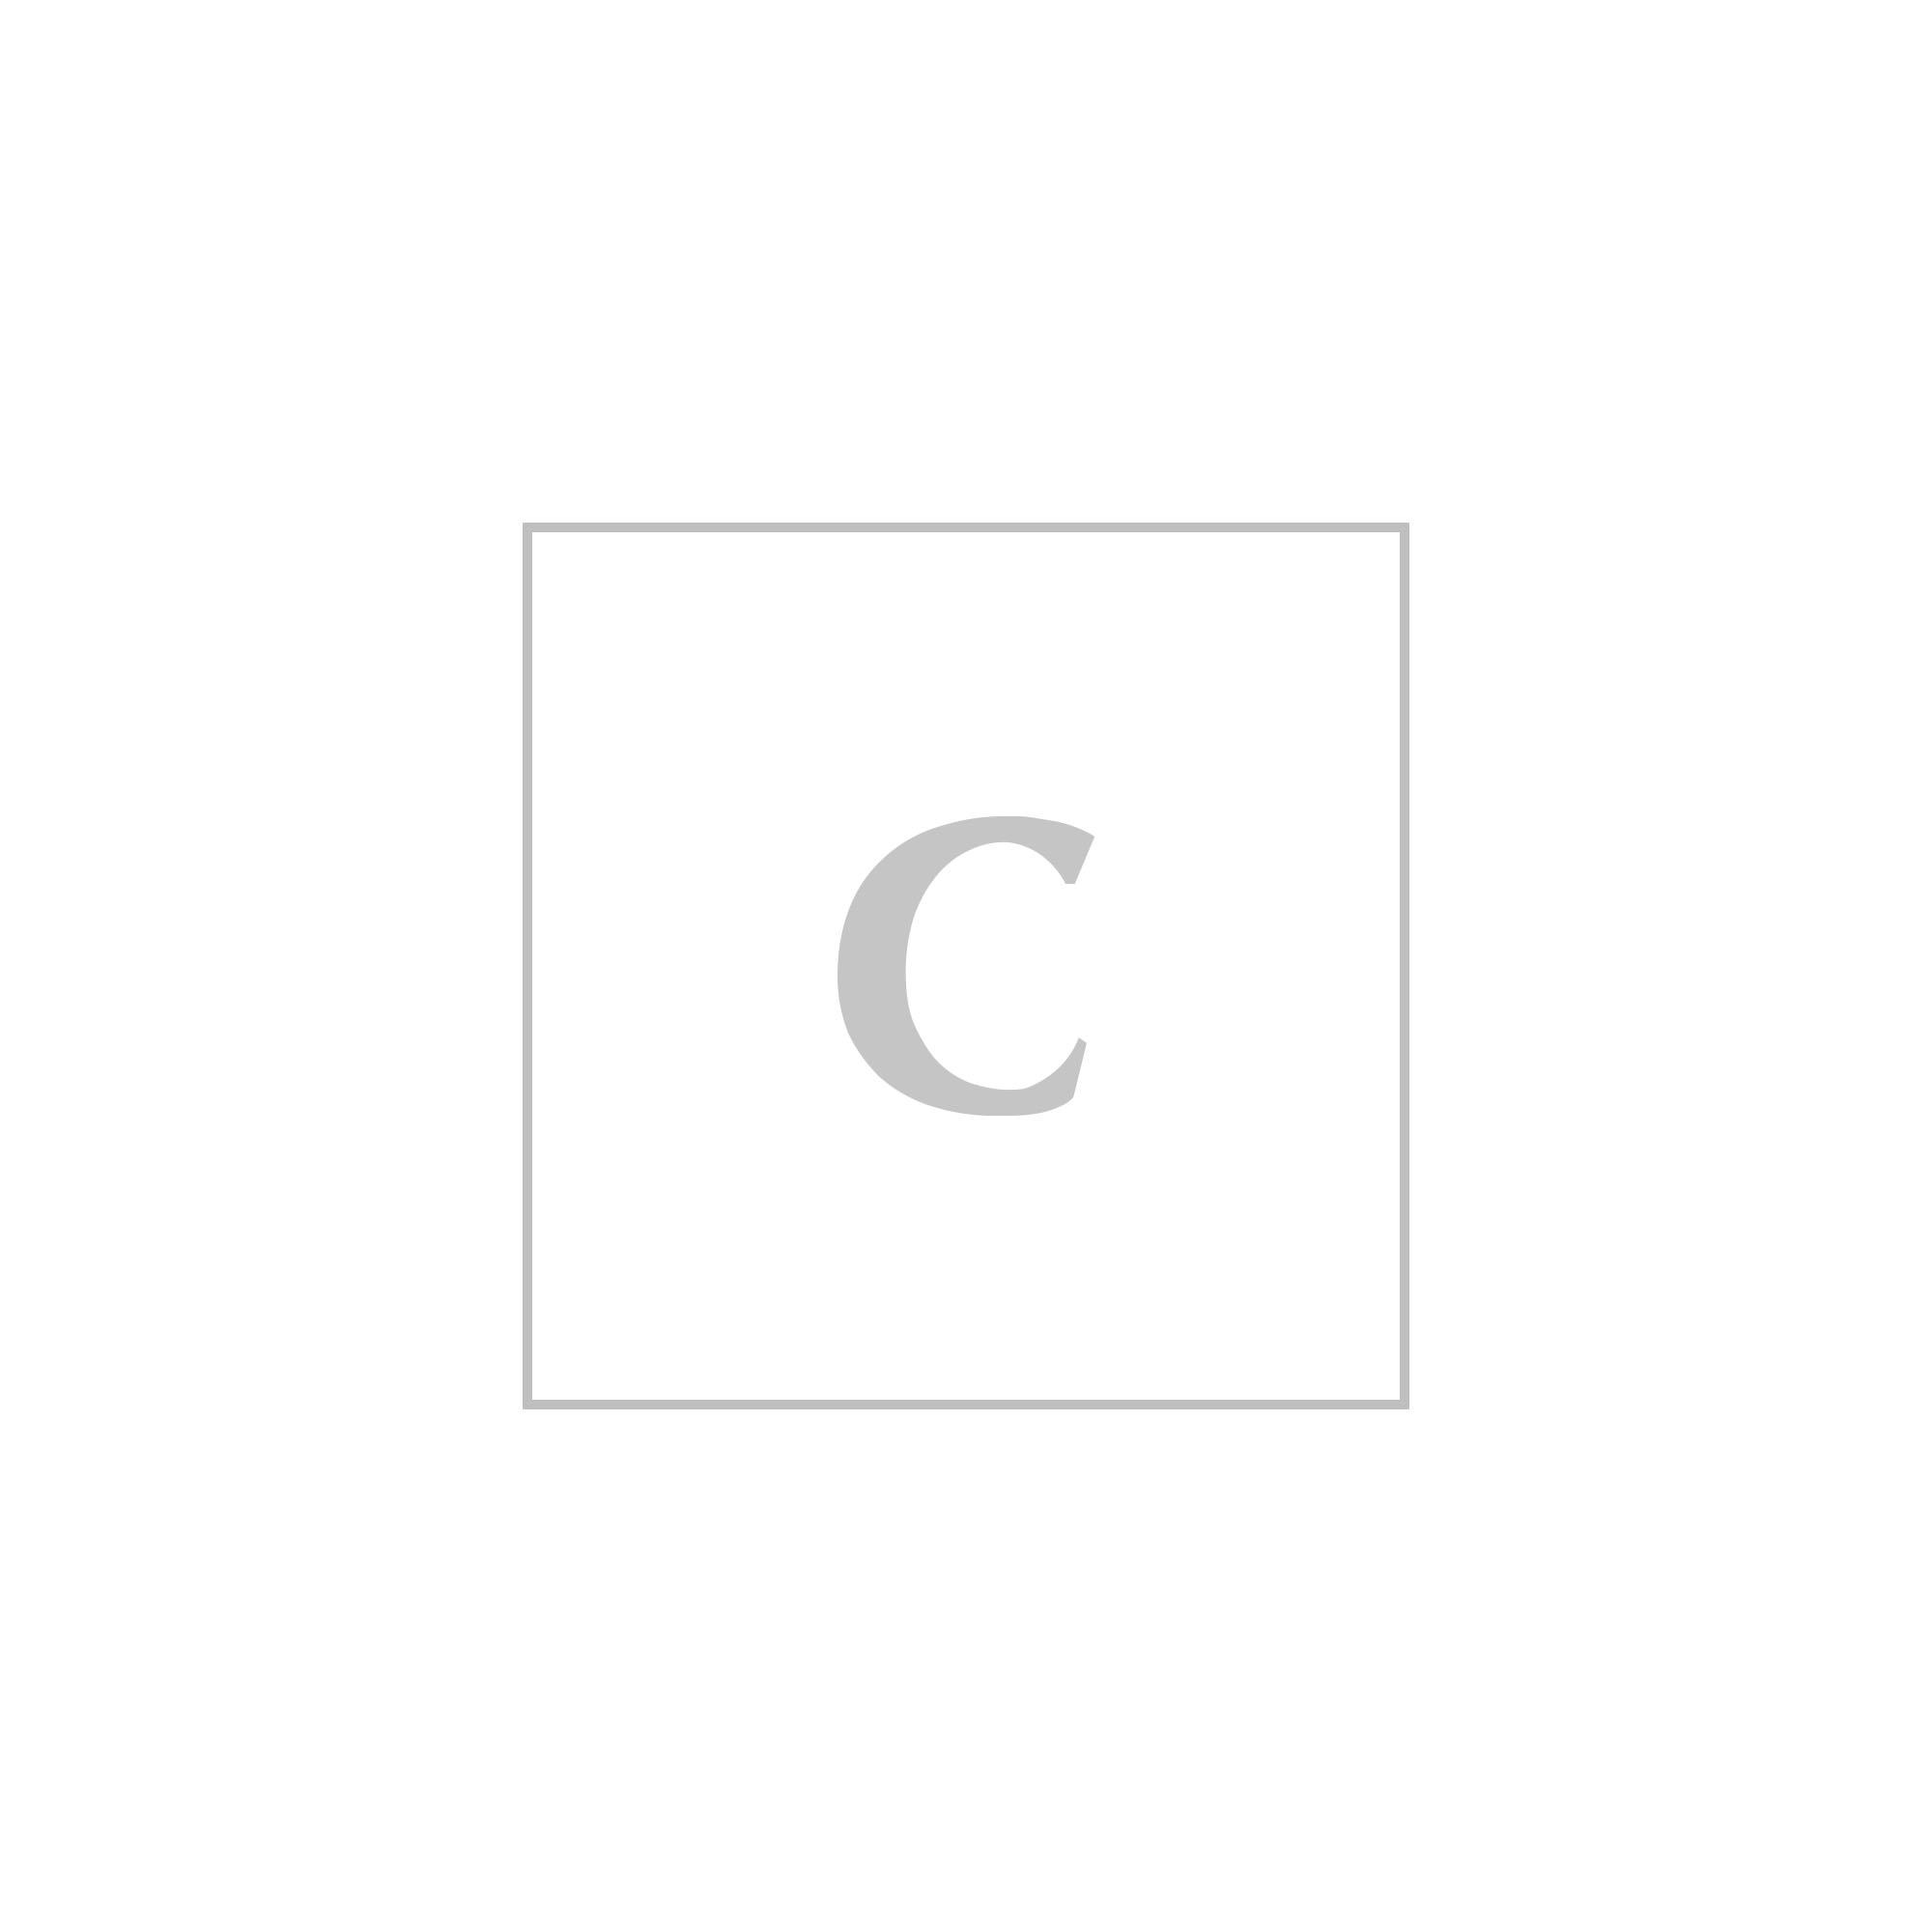 Saint laurent ysl nappa monogram clutch